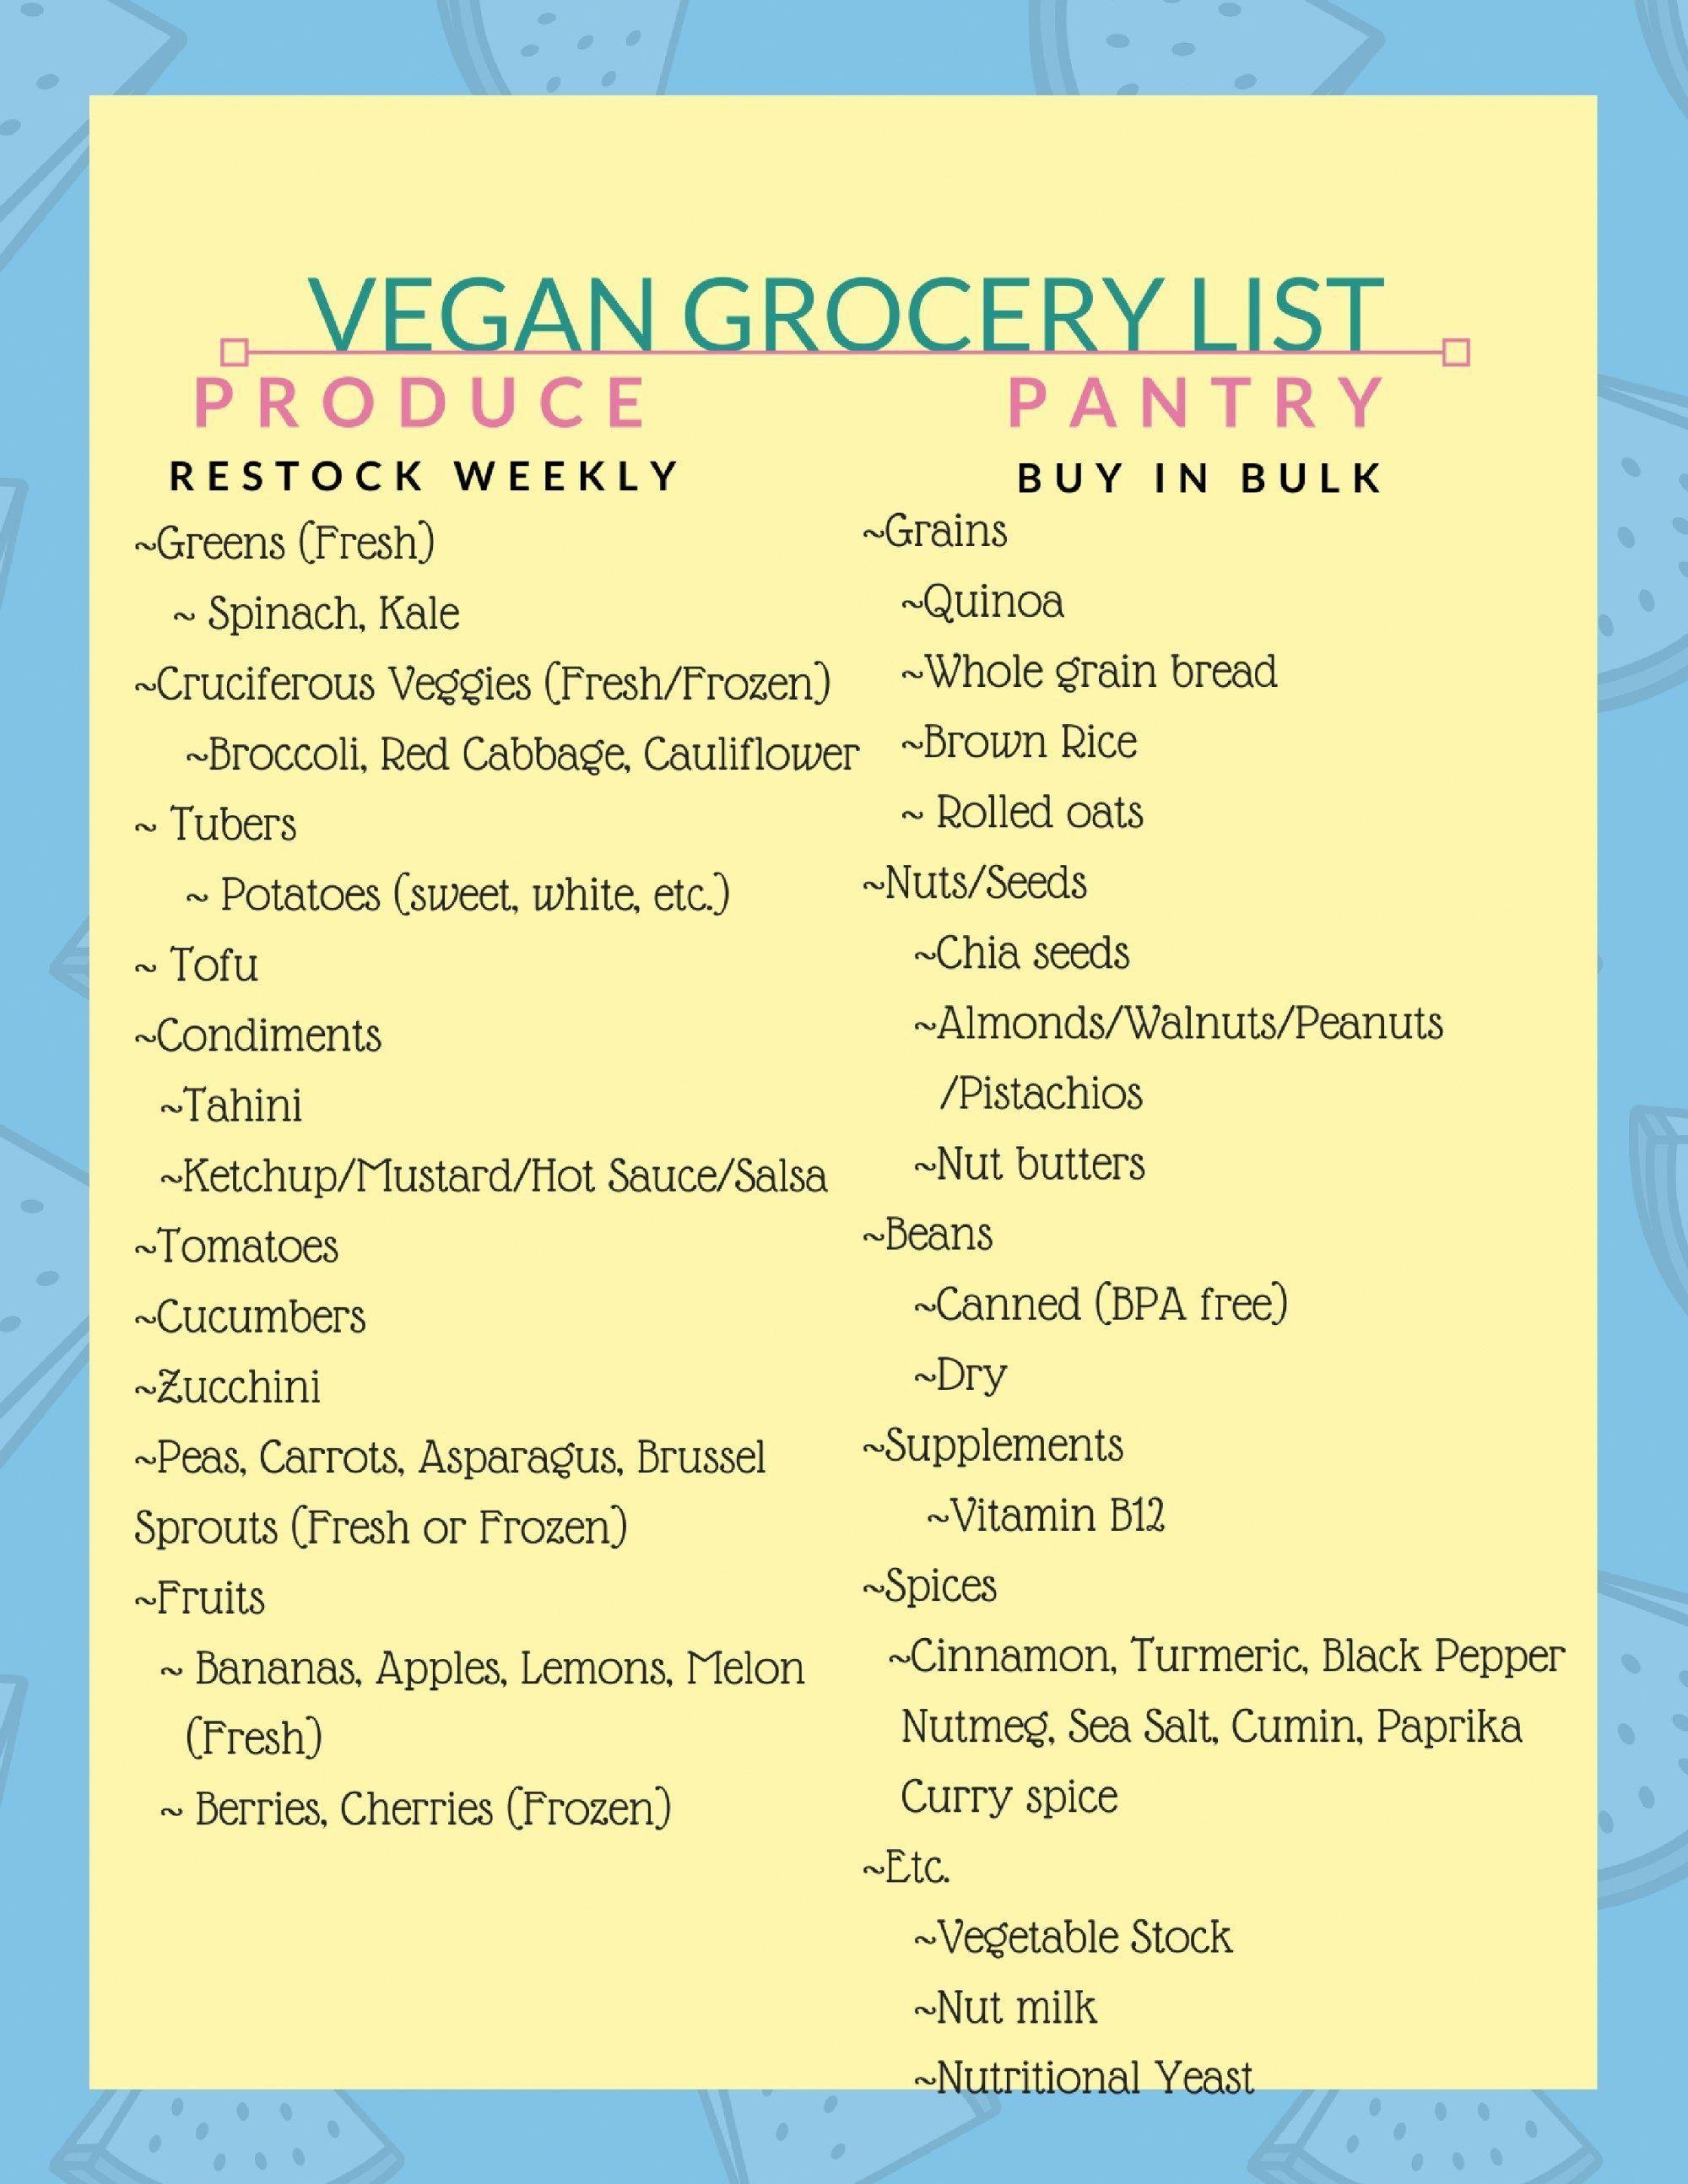 Check Out This Vegan Grocery List Vegan Grocery Vegan Pantry Staples Vegan Diet Vegan Meal Prep Vegan Starte Vegan Grocery Vegan Grocery List Vegan Pantry